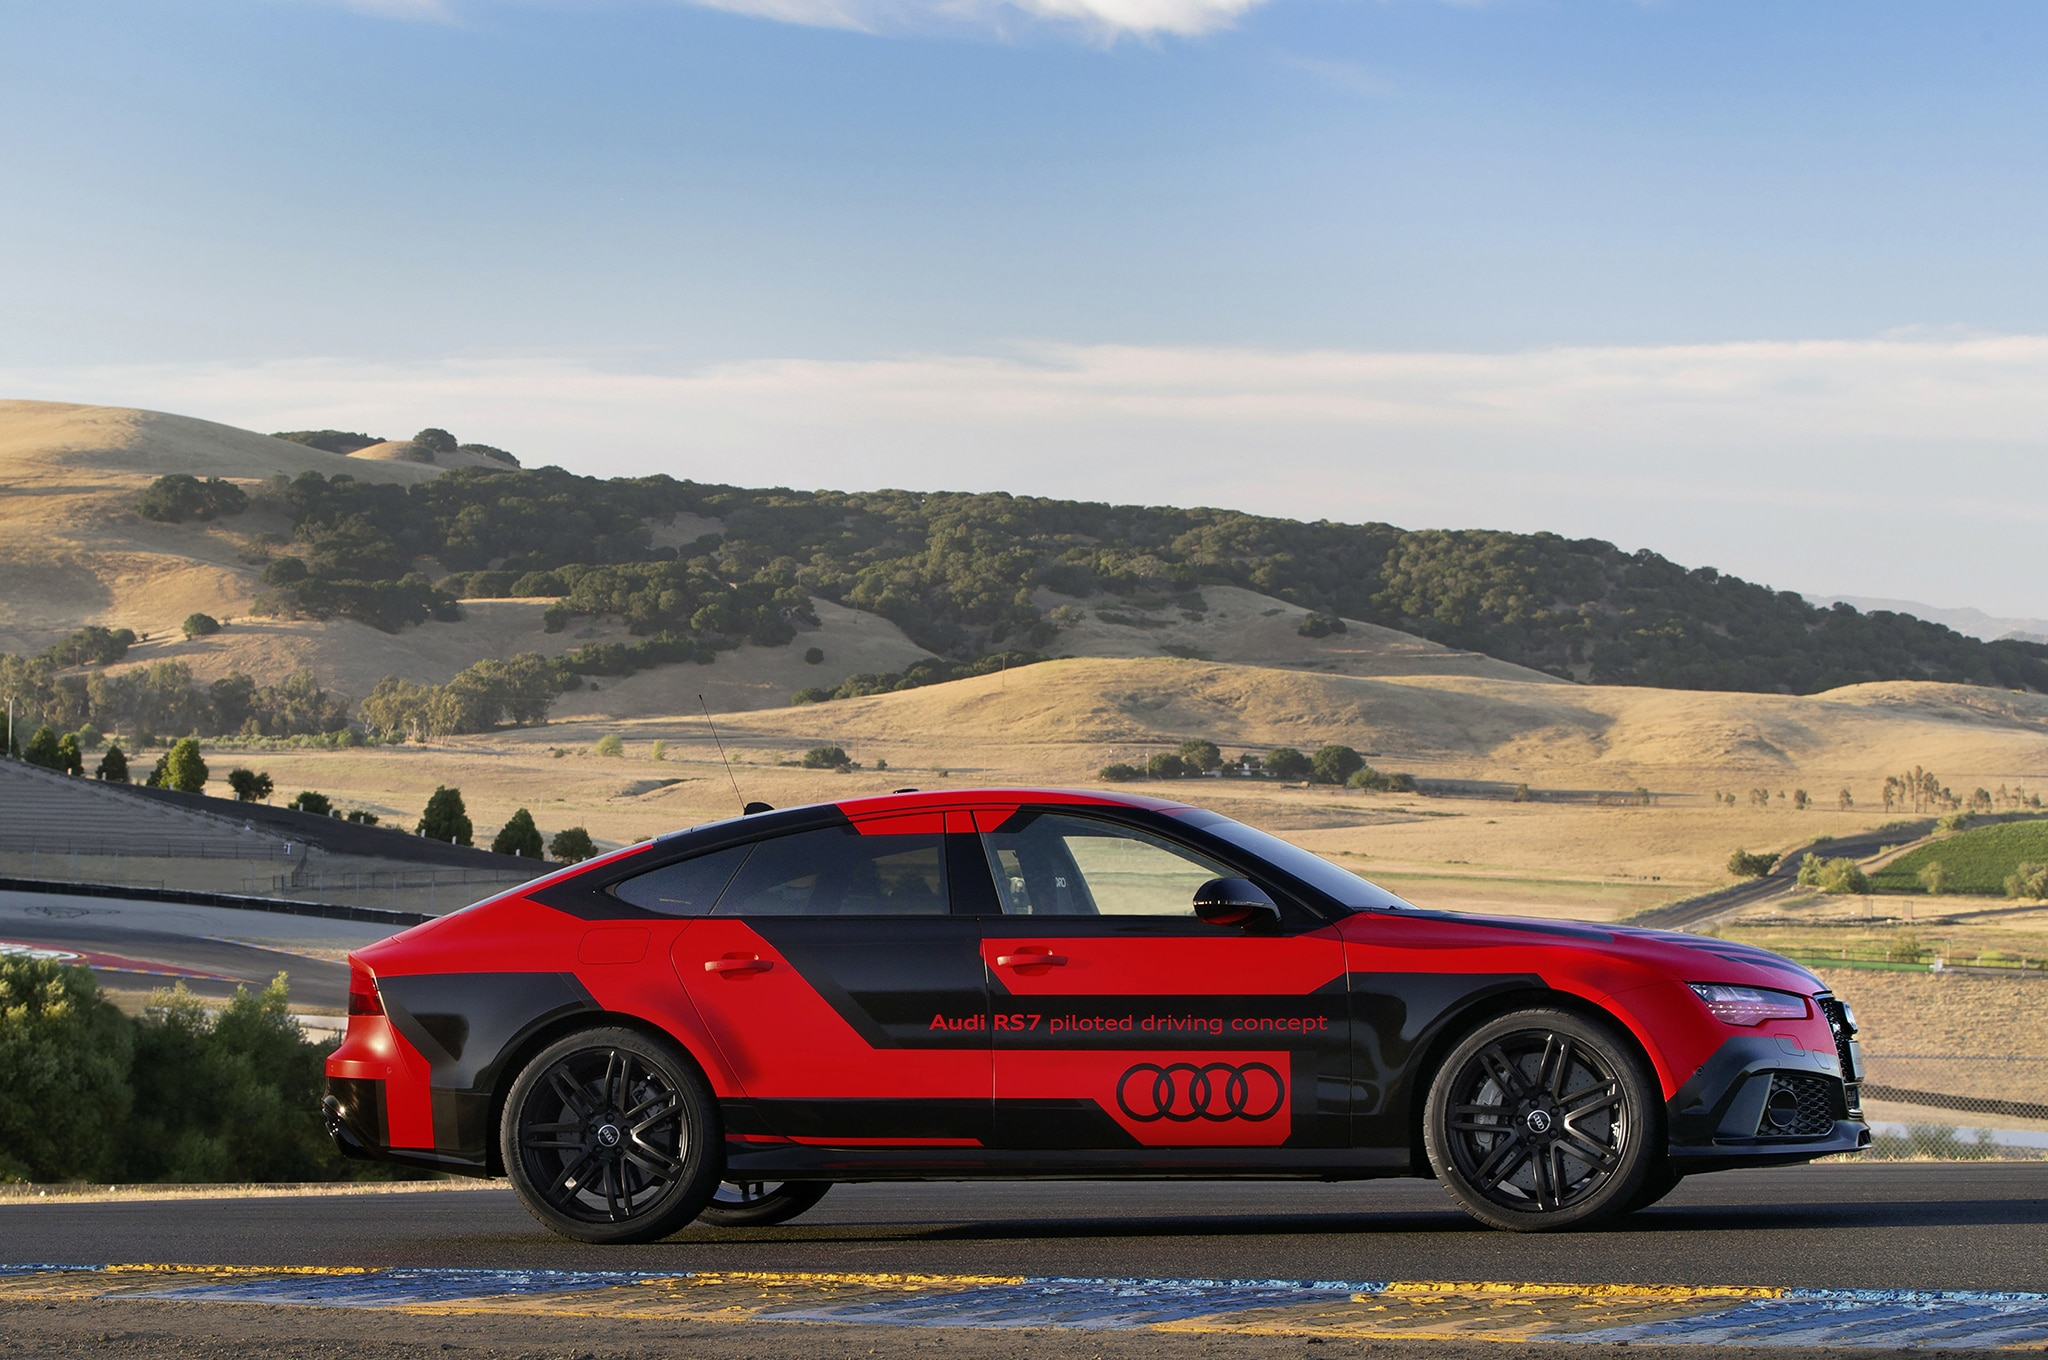 audi rs 7 autonomous car sets faster laps than humans at sonoma. Black Bedroom Furniture Sets. Home Design Ideas